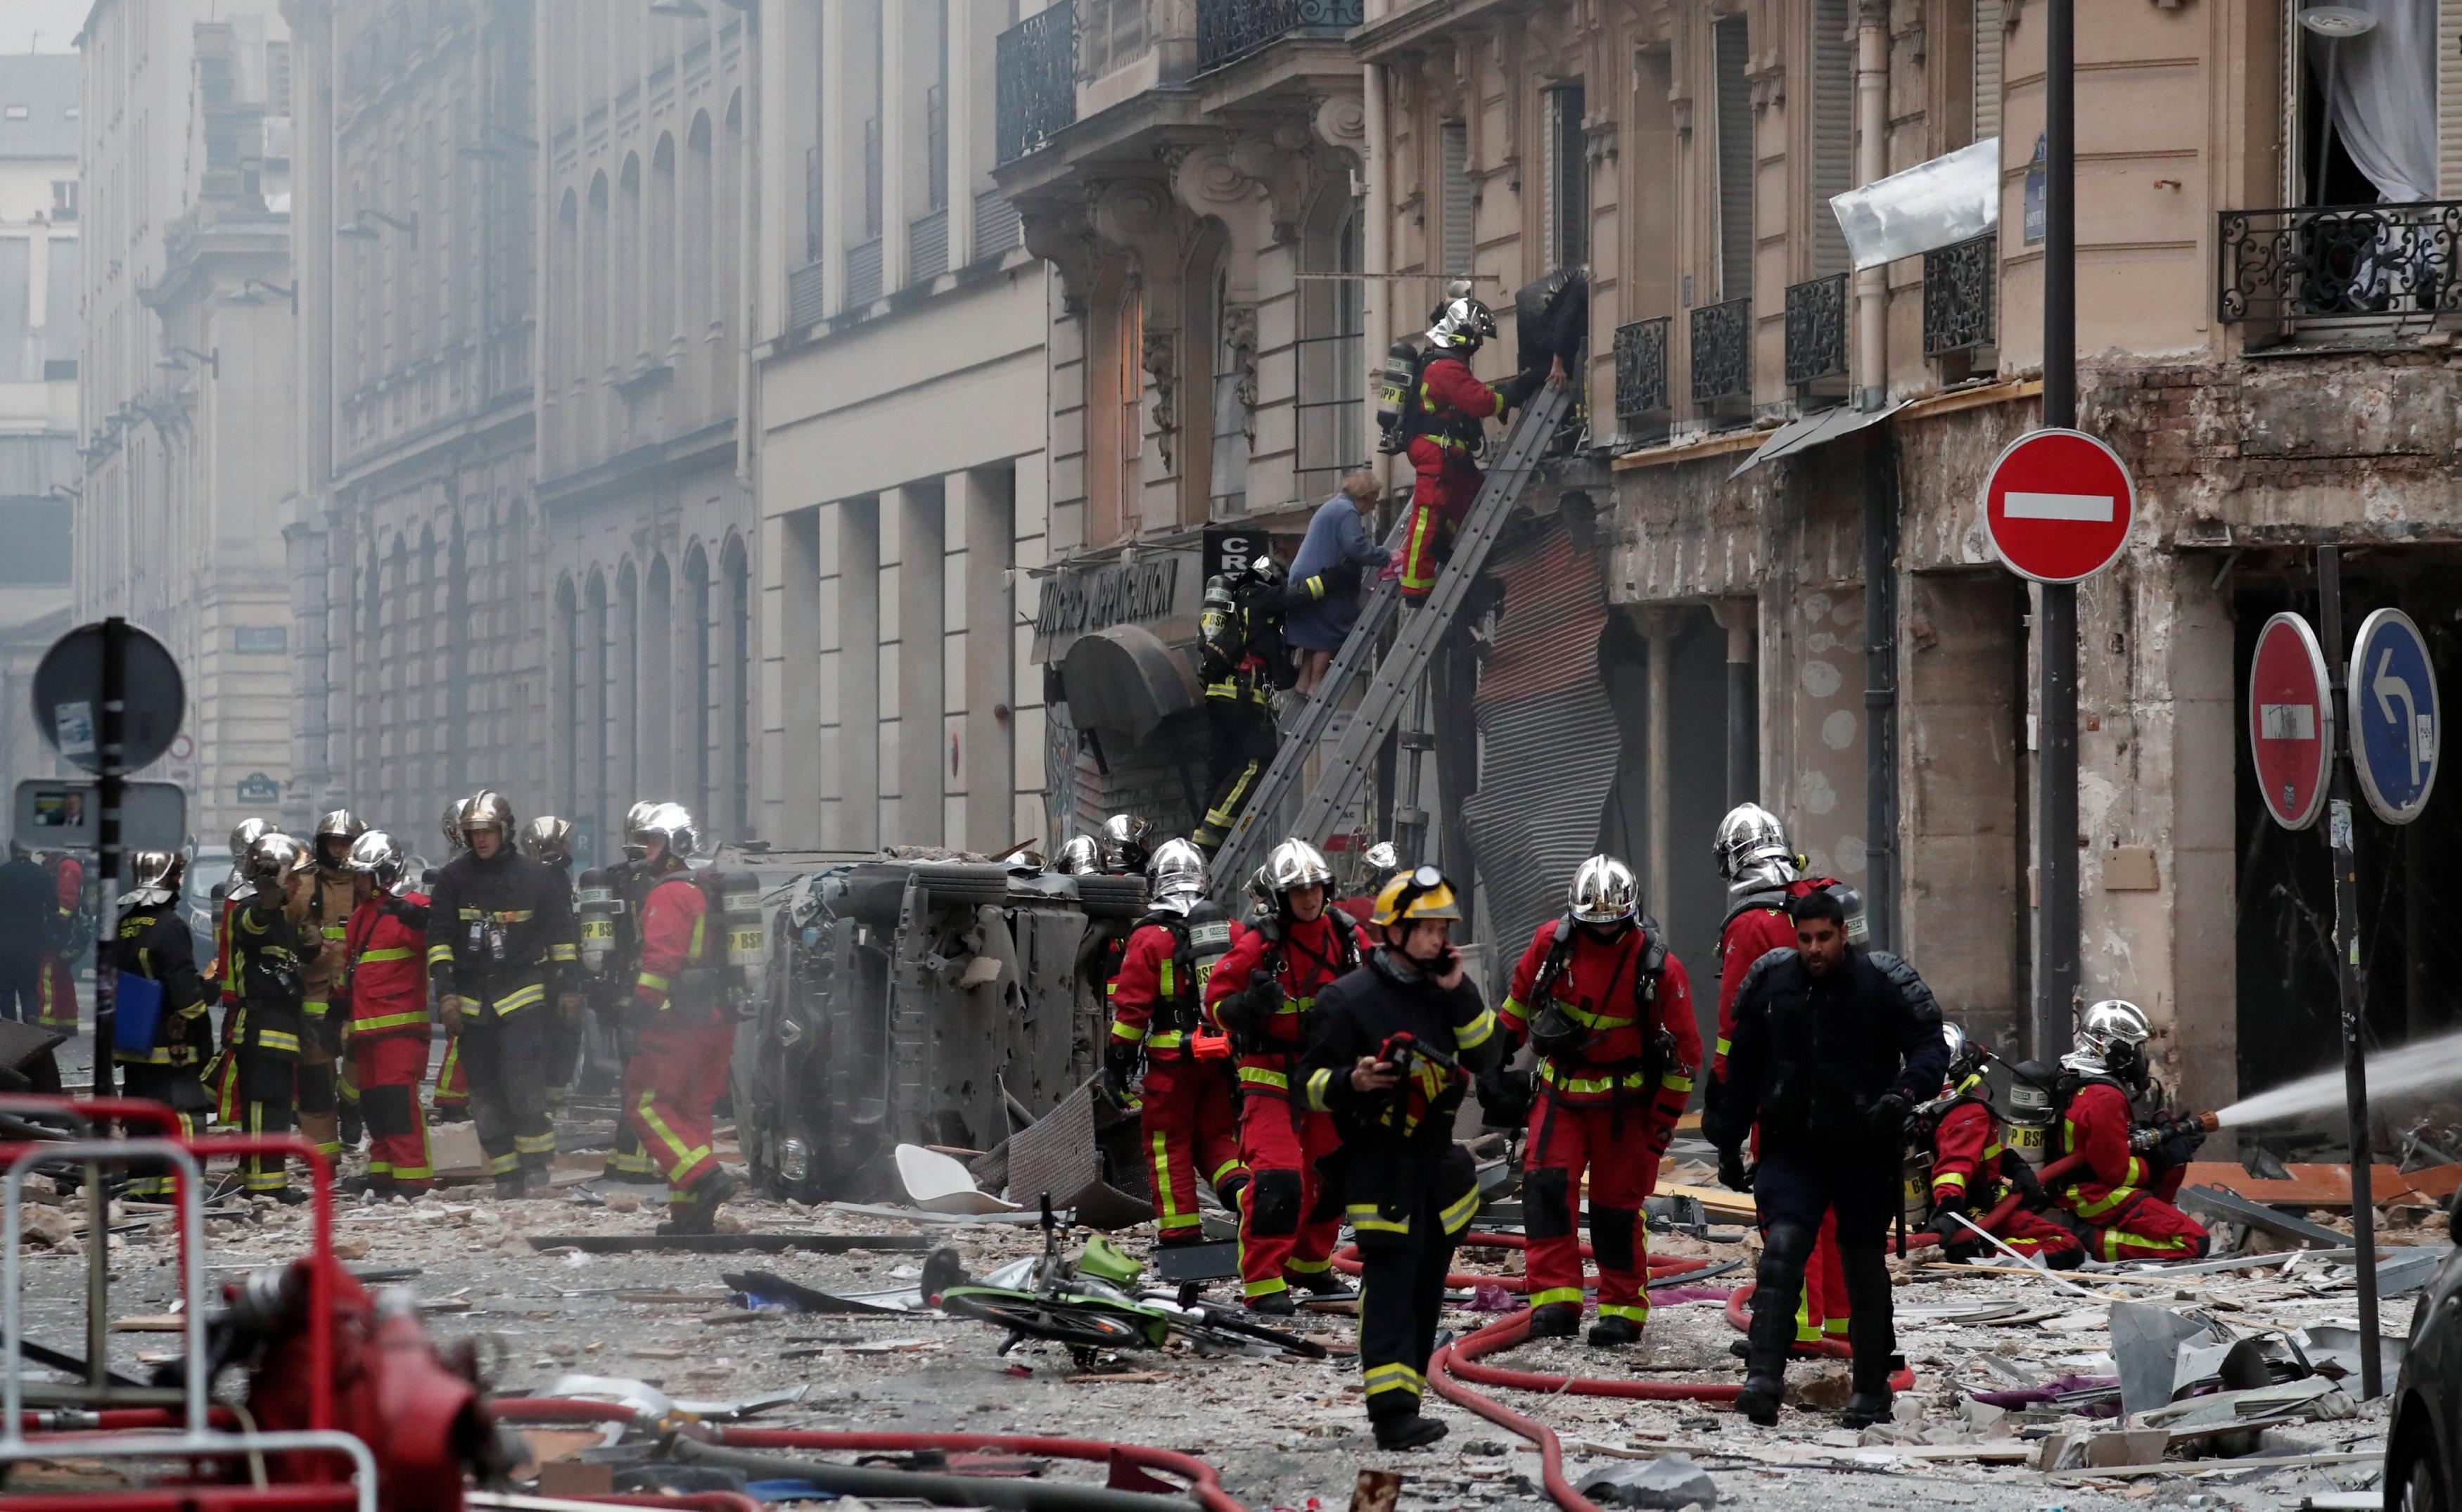 firemen-work_1 Τέσσερις νεκροί από την ισχυρή έκρηξη σε αρτοποιείο στο κέντρο του Παρισιού